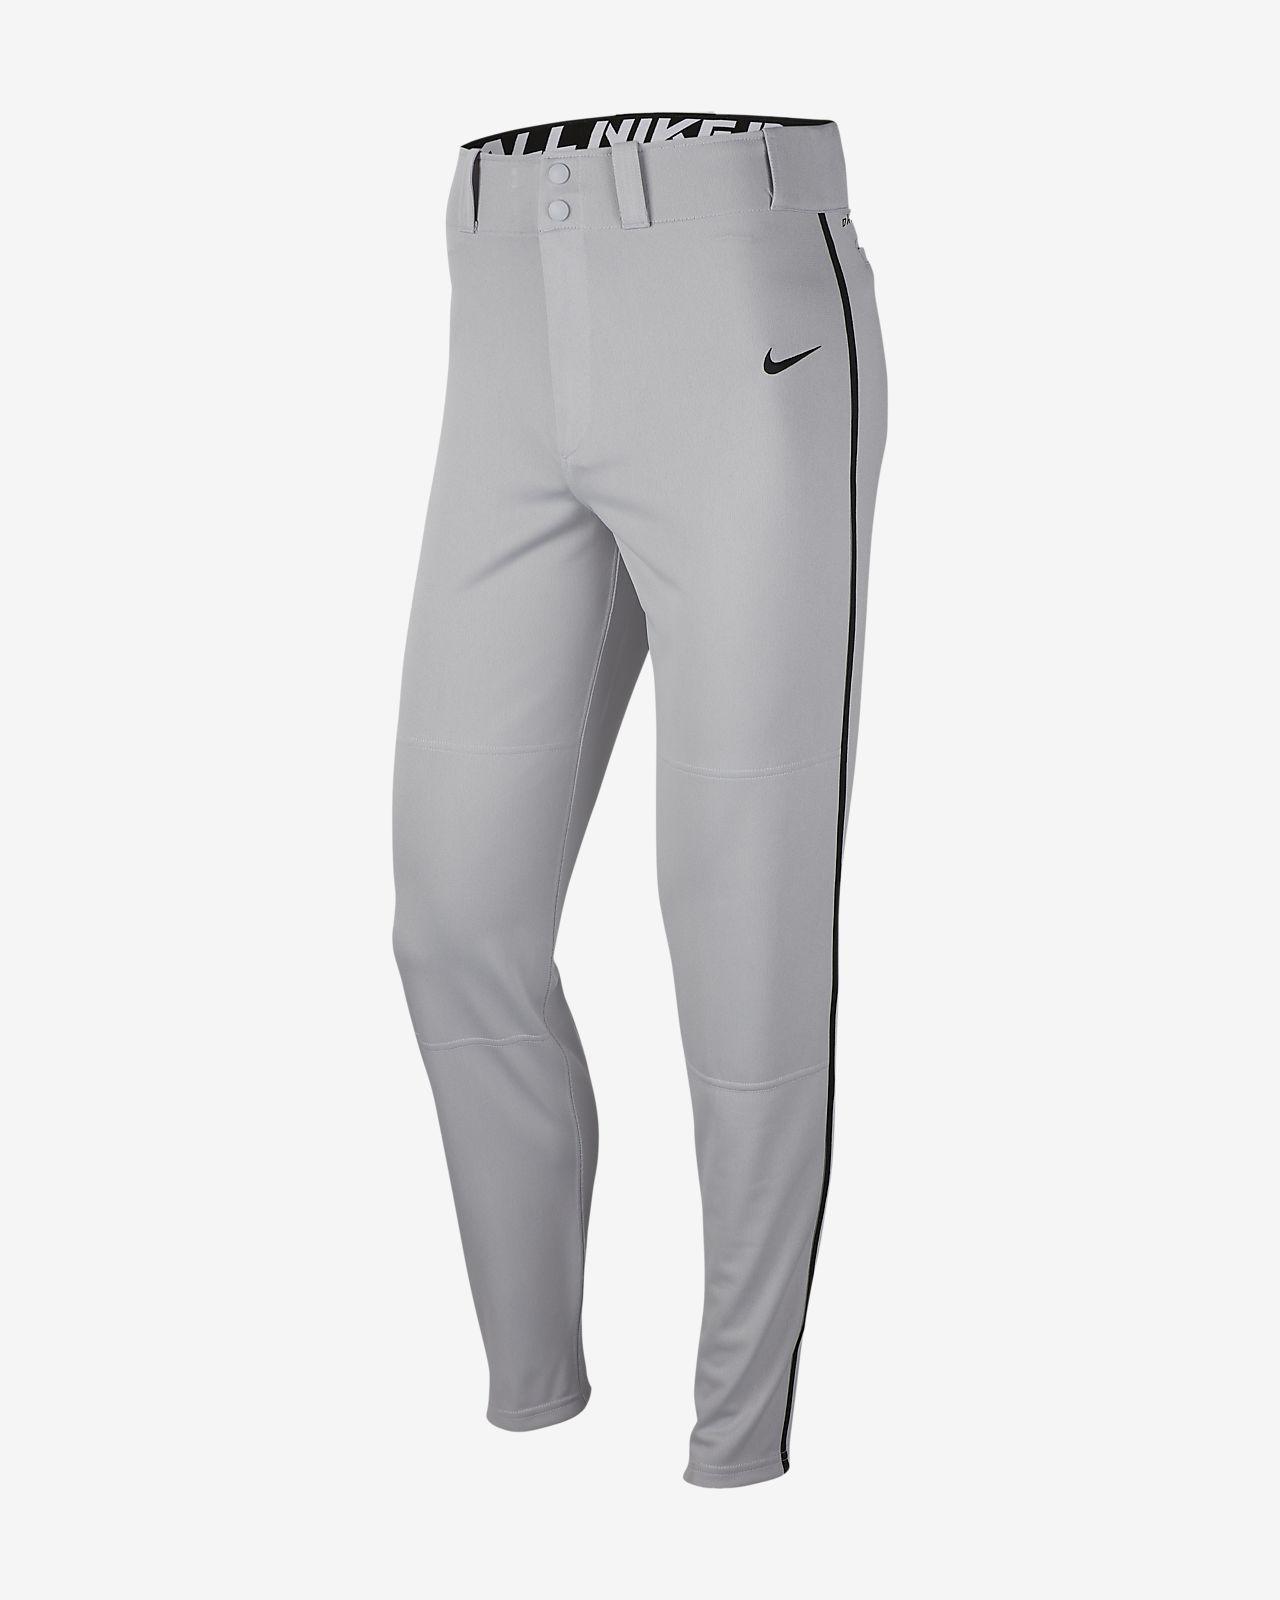 Nike Swoosh Men's Baseball Pants